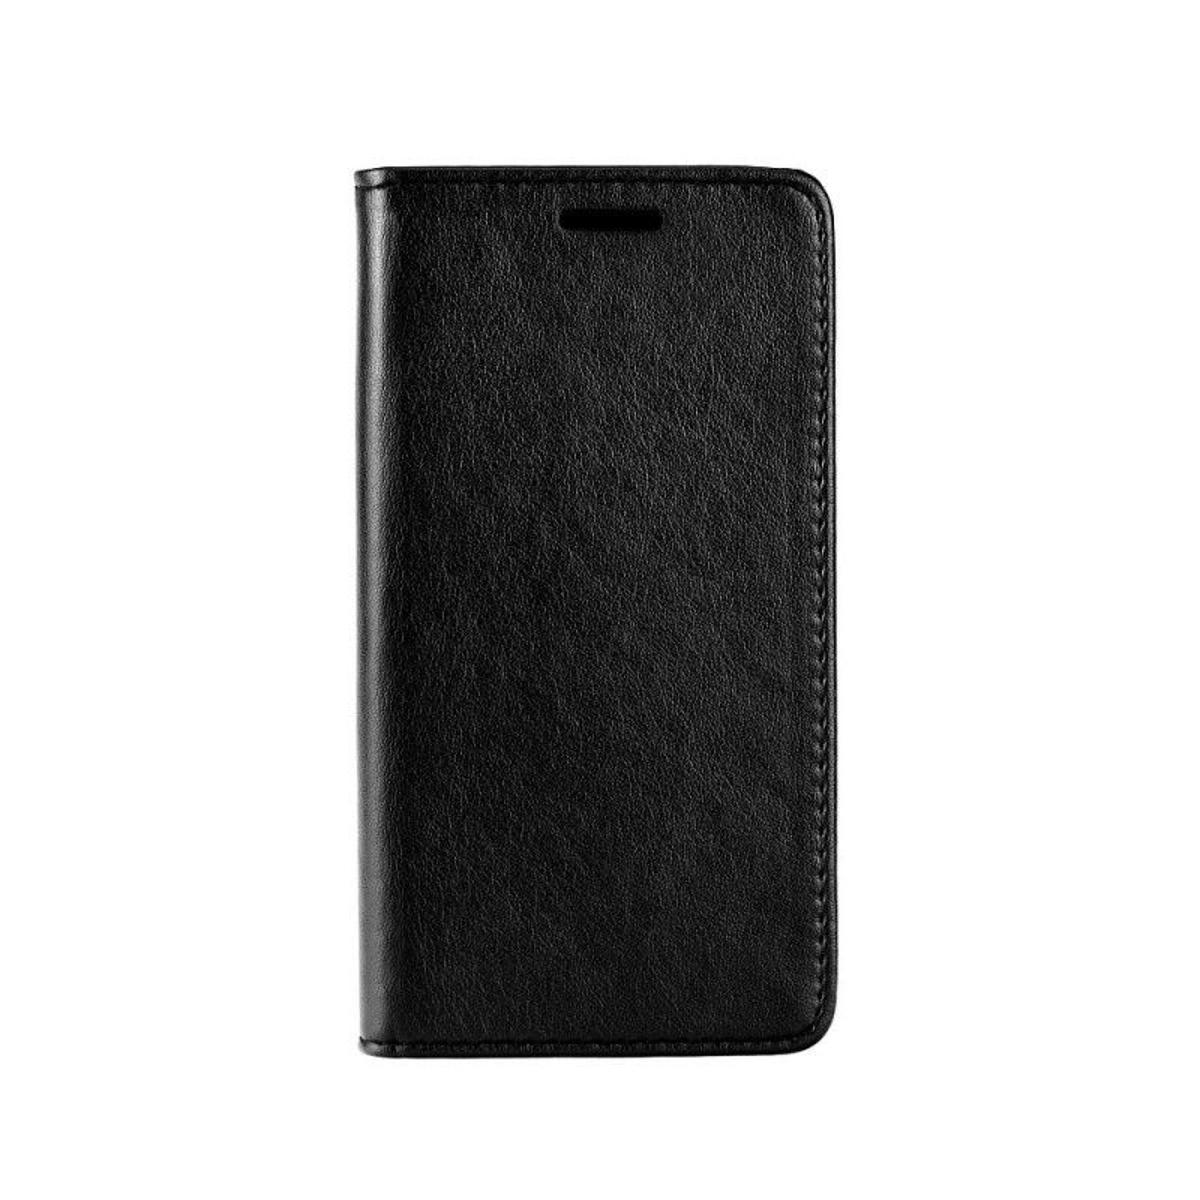 Etui Galaxy J5 (2017) Porte-cartes Noir - Crazy Kase